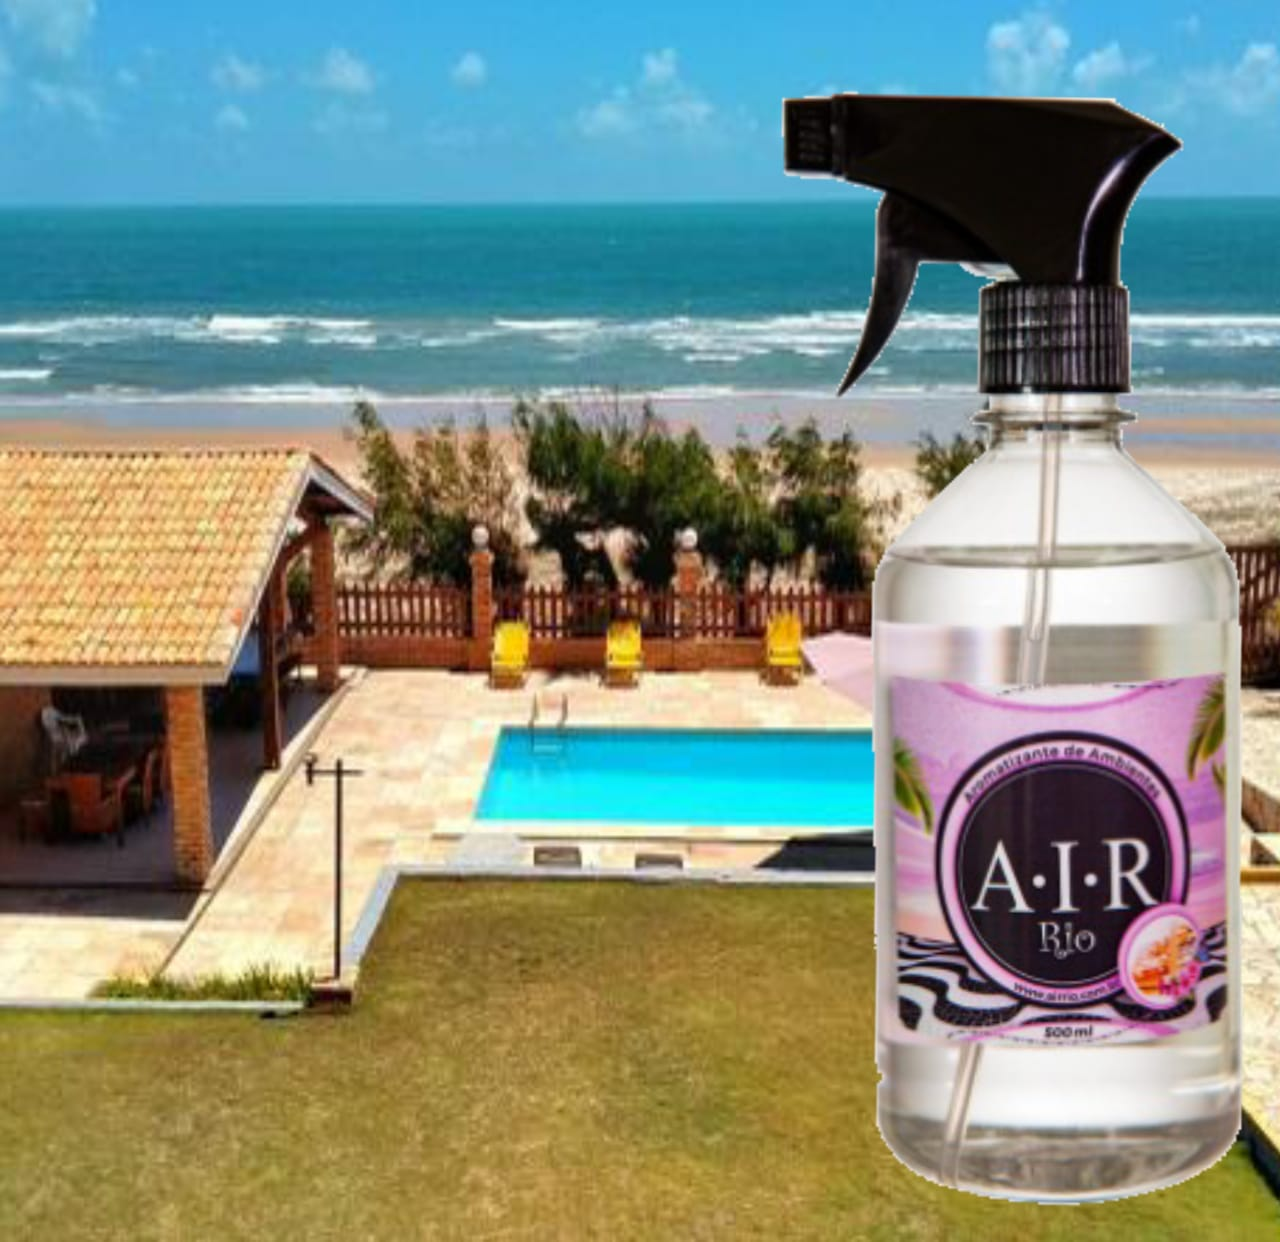 AROMATIZADOR DE AMBIENTE SPRAY AIR RIO - 7714 - Cítrica Verde - 500ML